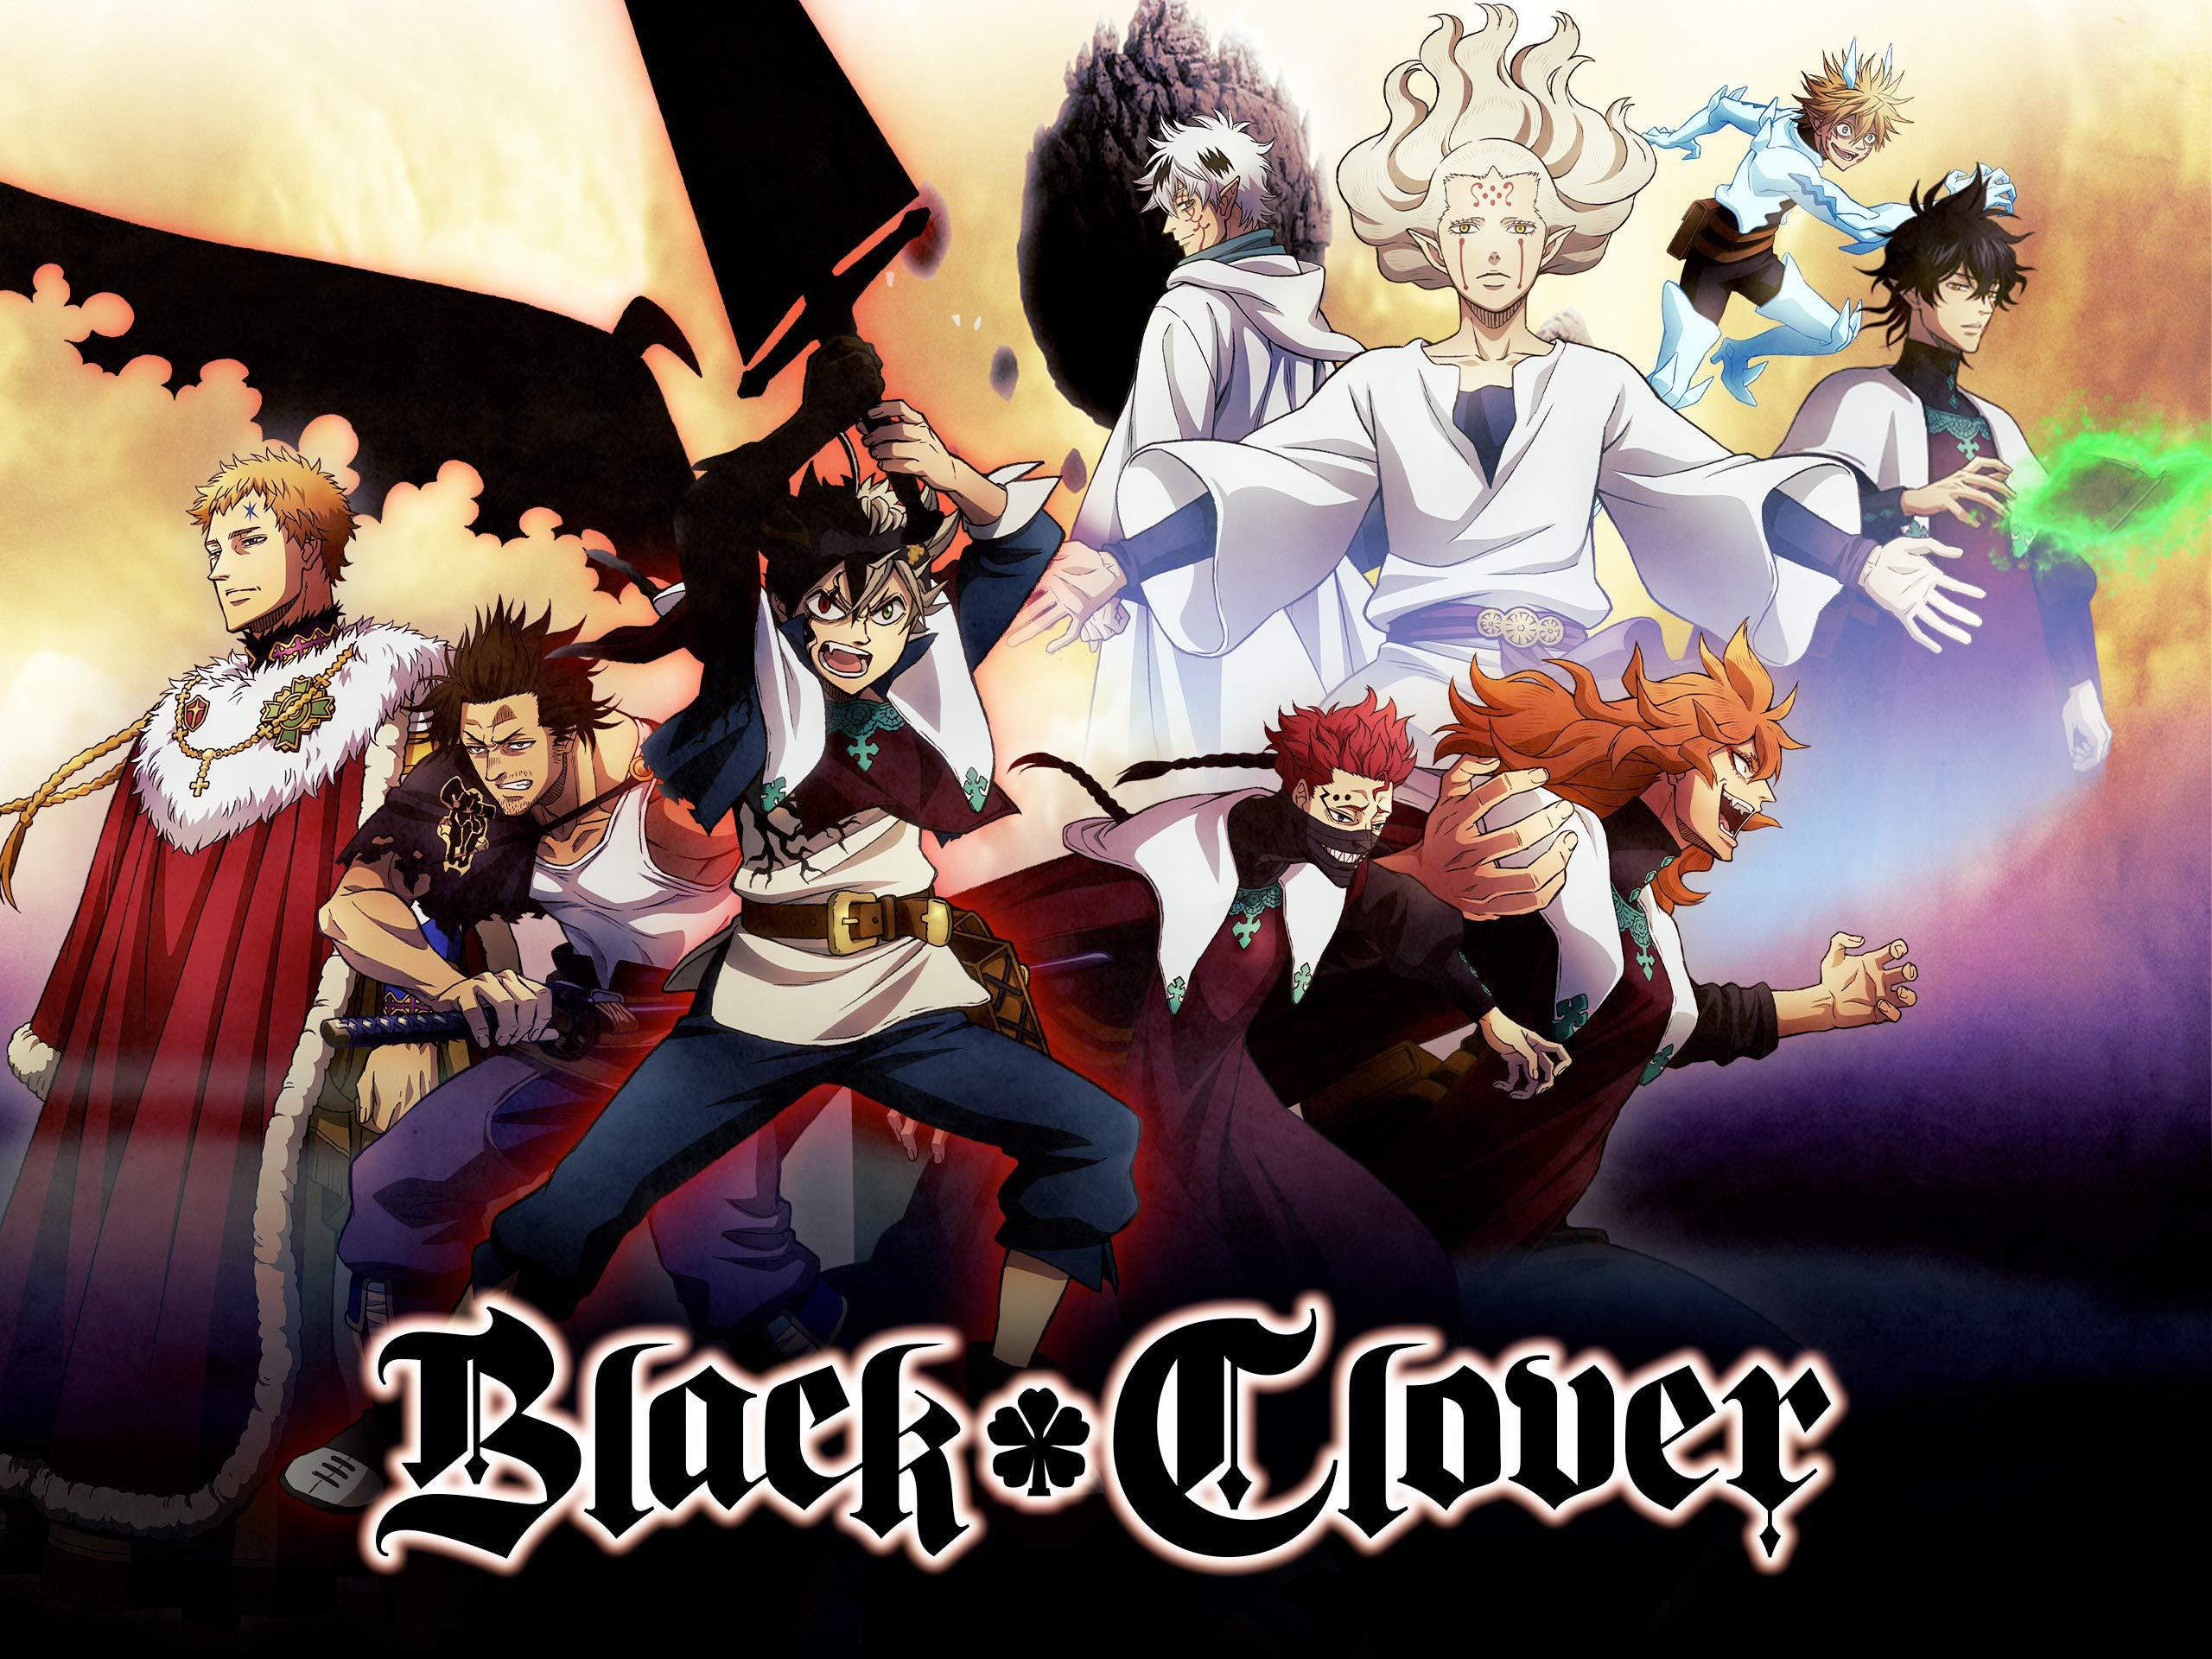 Watch Black Clover Season 3 Pt 3 Original Japanese Version Prime Video